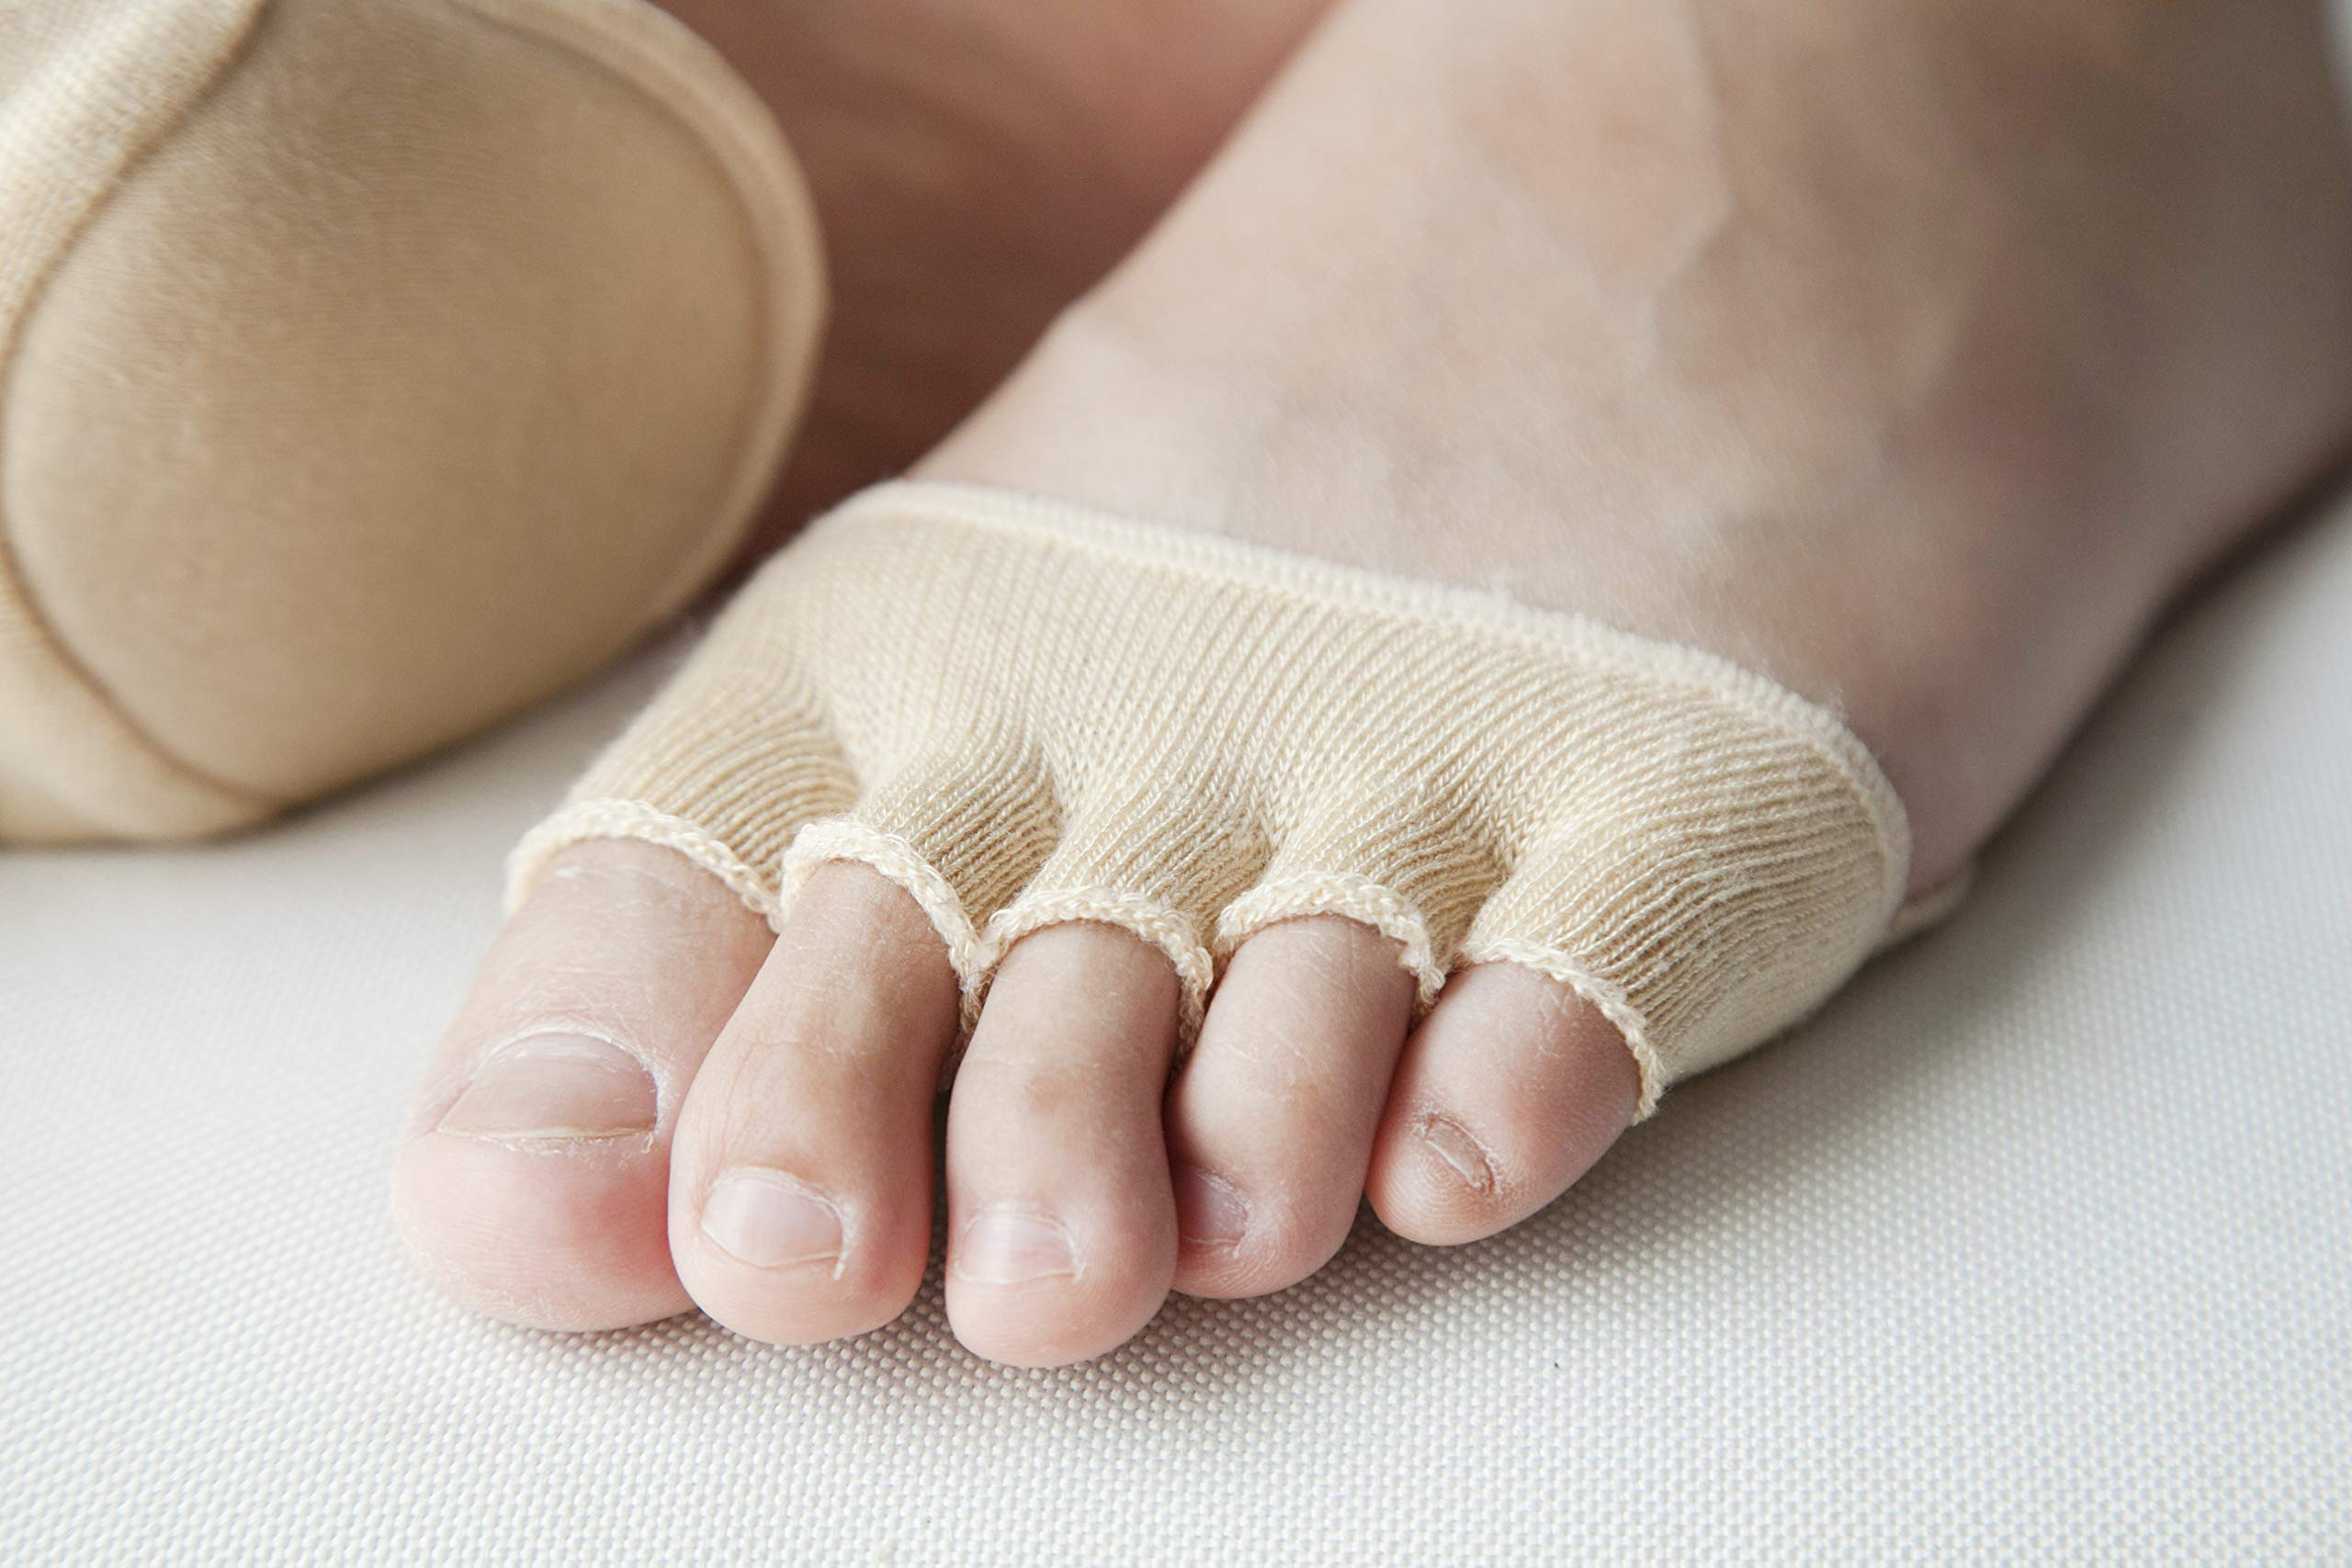 Toe Socks, Cotton Non-Slip Women's Toe Toppers Socks Toe Separating Socks No-Show Half Socks Barre Pilates Yoga Half Palm Socks(2 Pairs) by Pnrskter (Image #4)